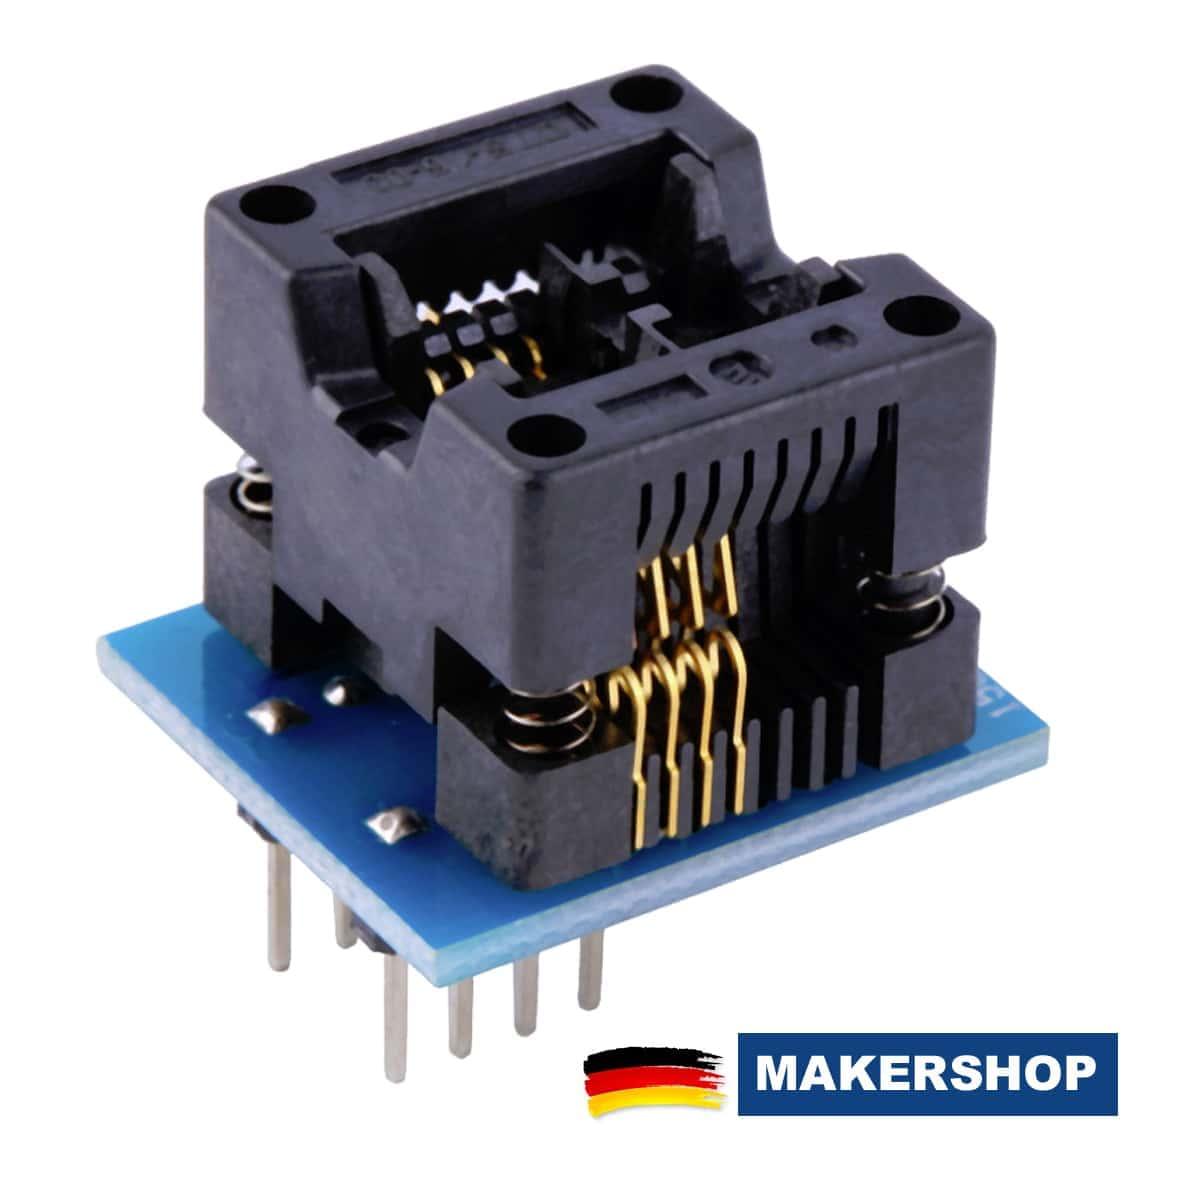 SMD SO8 SOP8 SOIC8 DIP8 2,54mm DIP8 Programmier Adapter SMD-Sockel 150mil